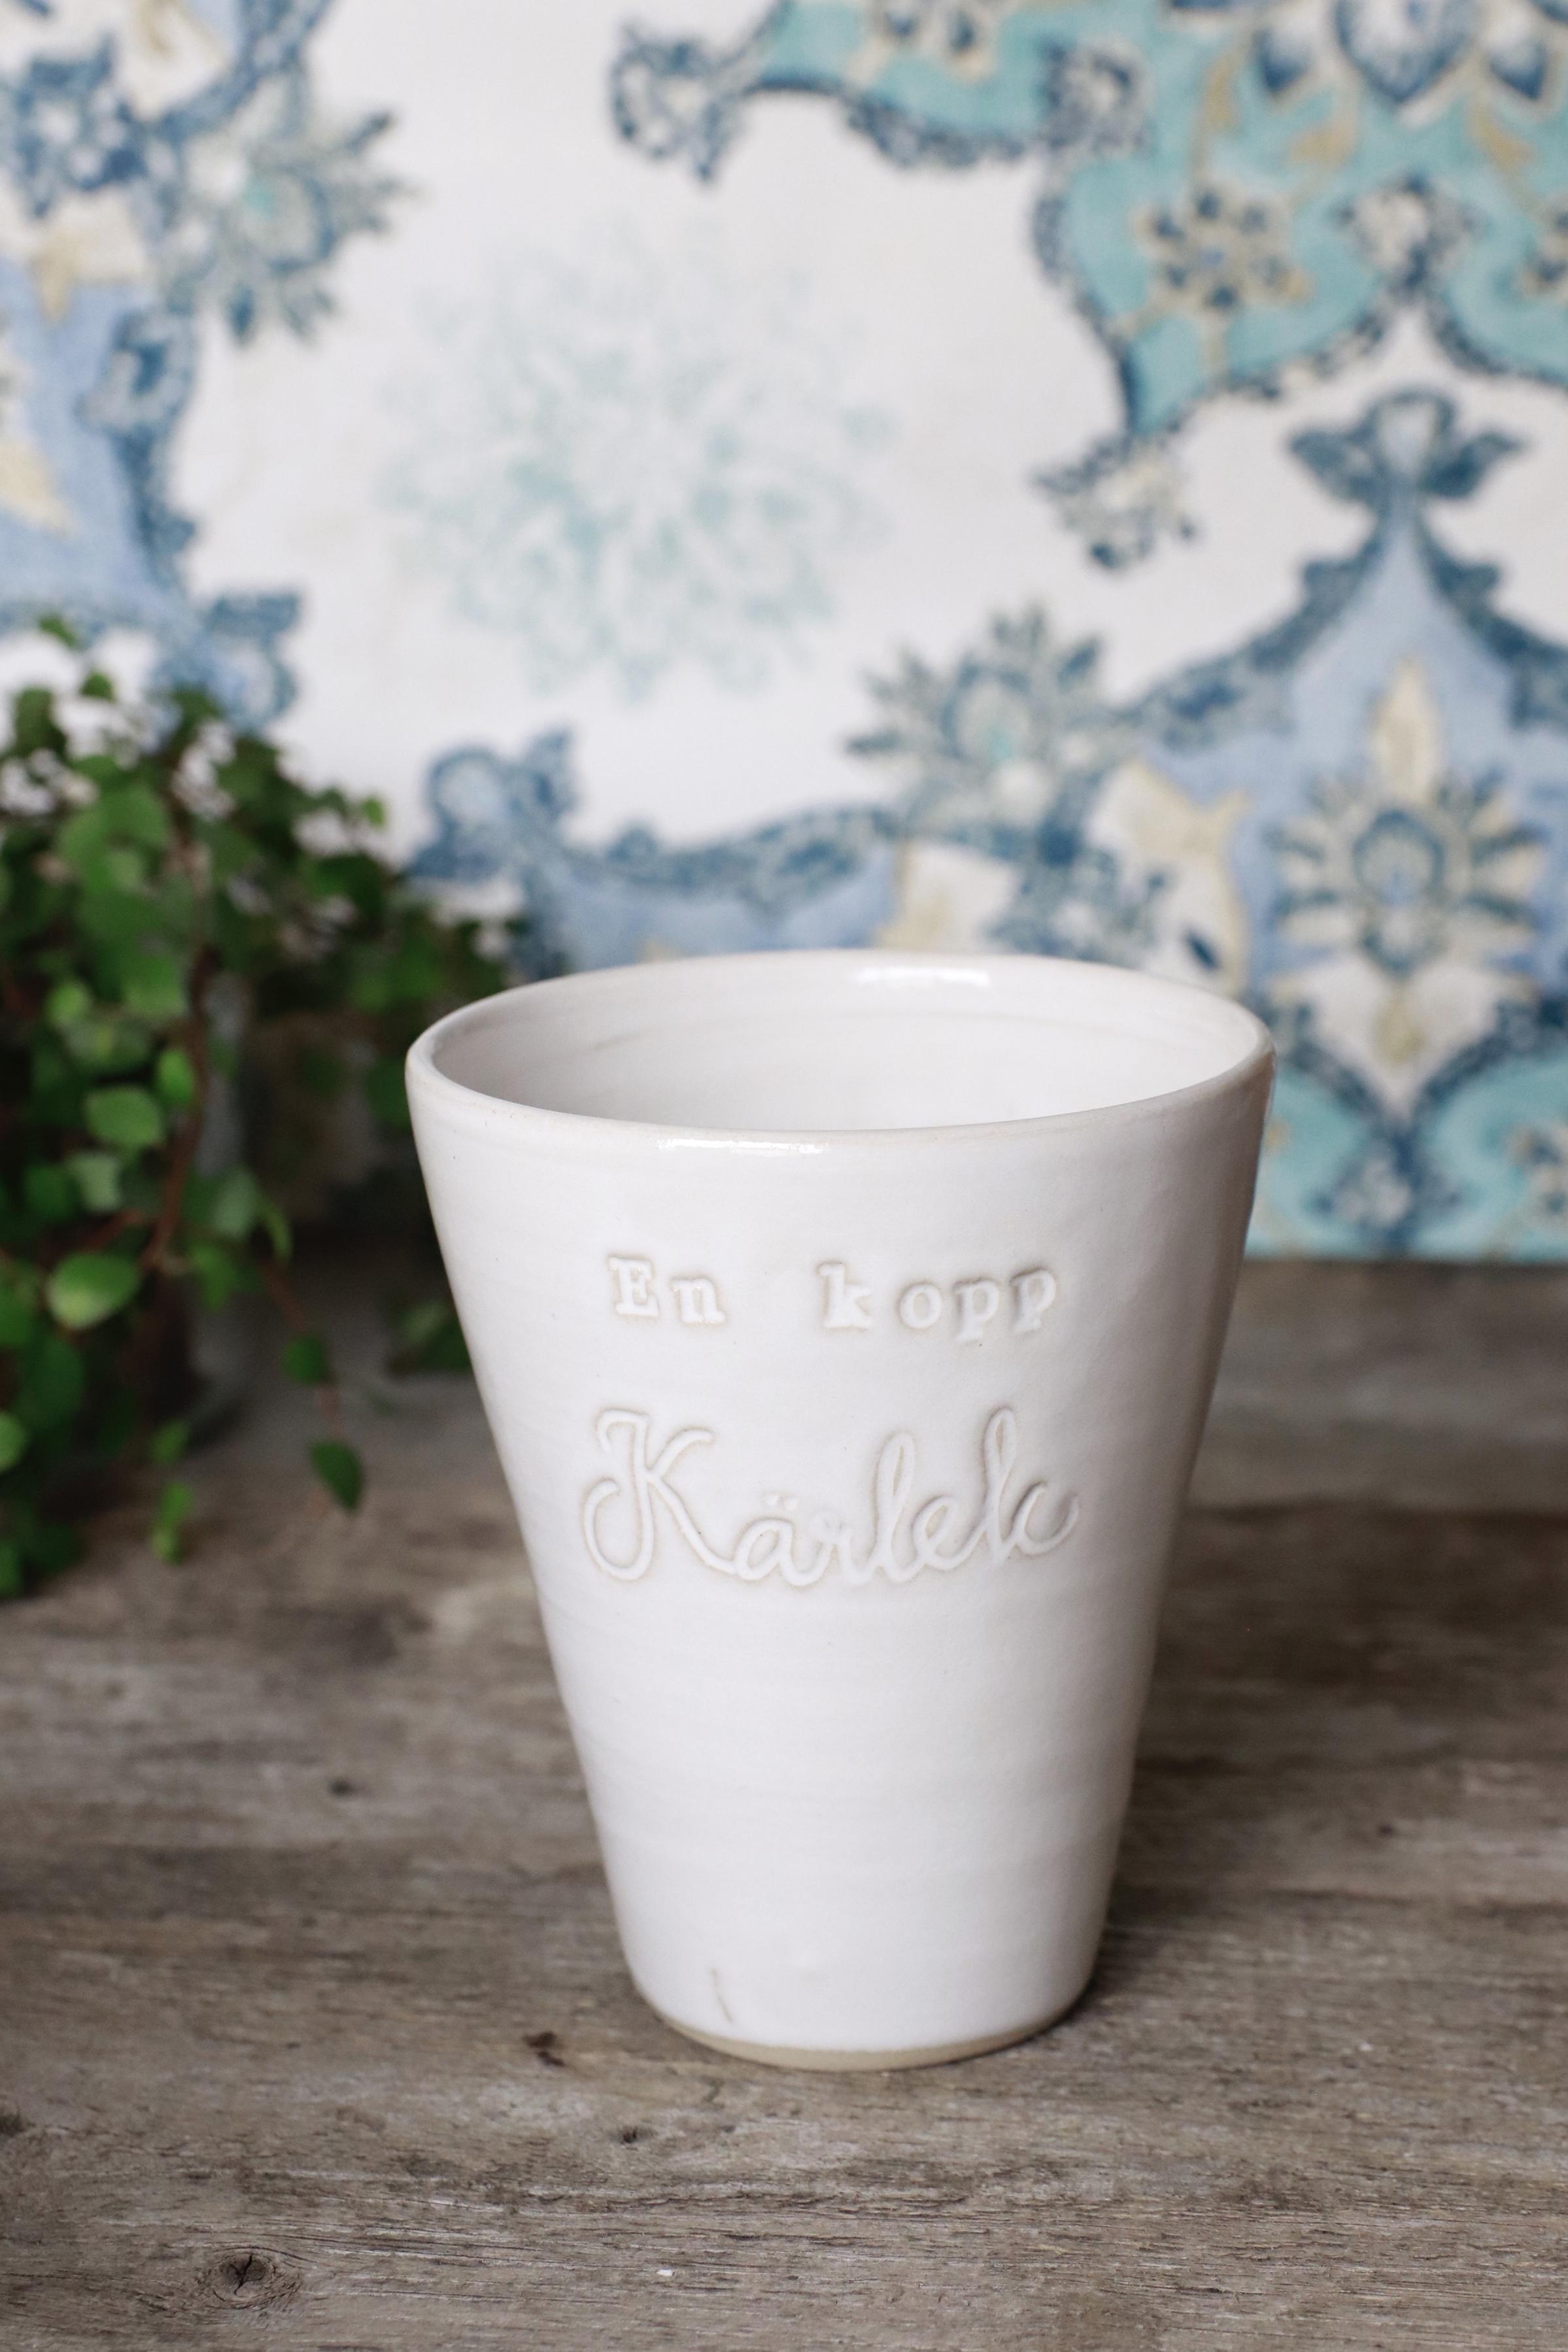 Budskapsmugg  En kopp.... (fler varianter)